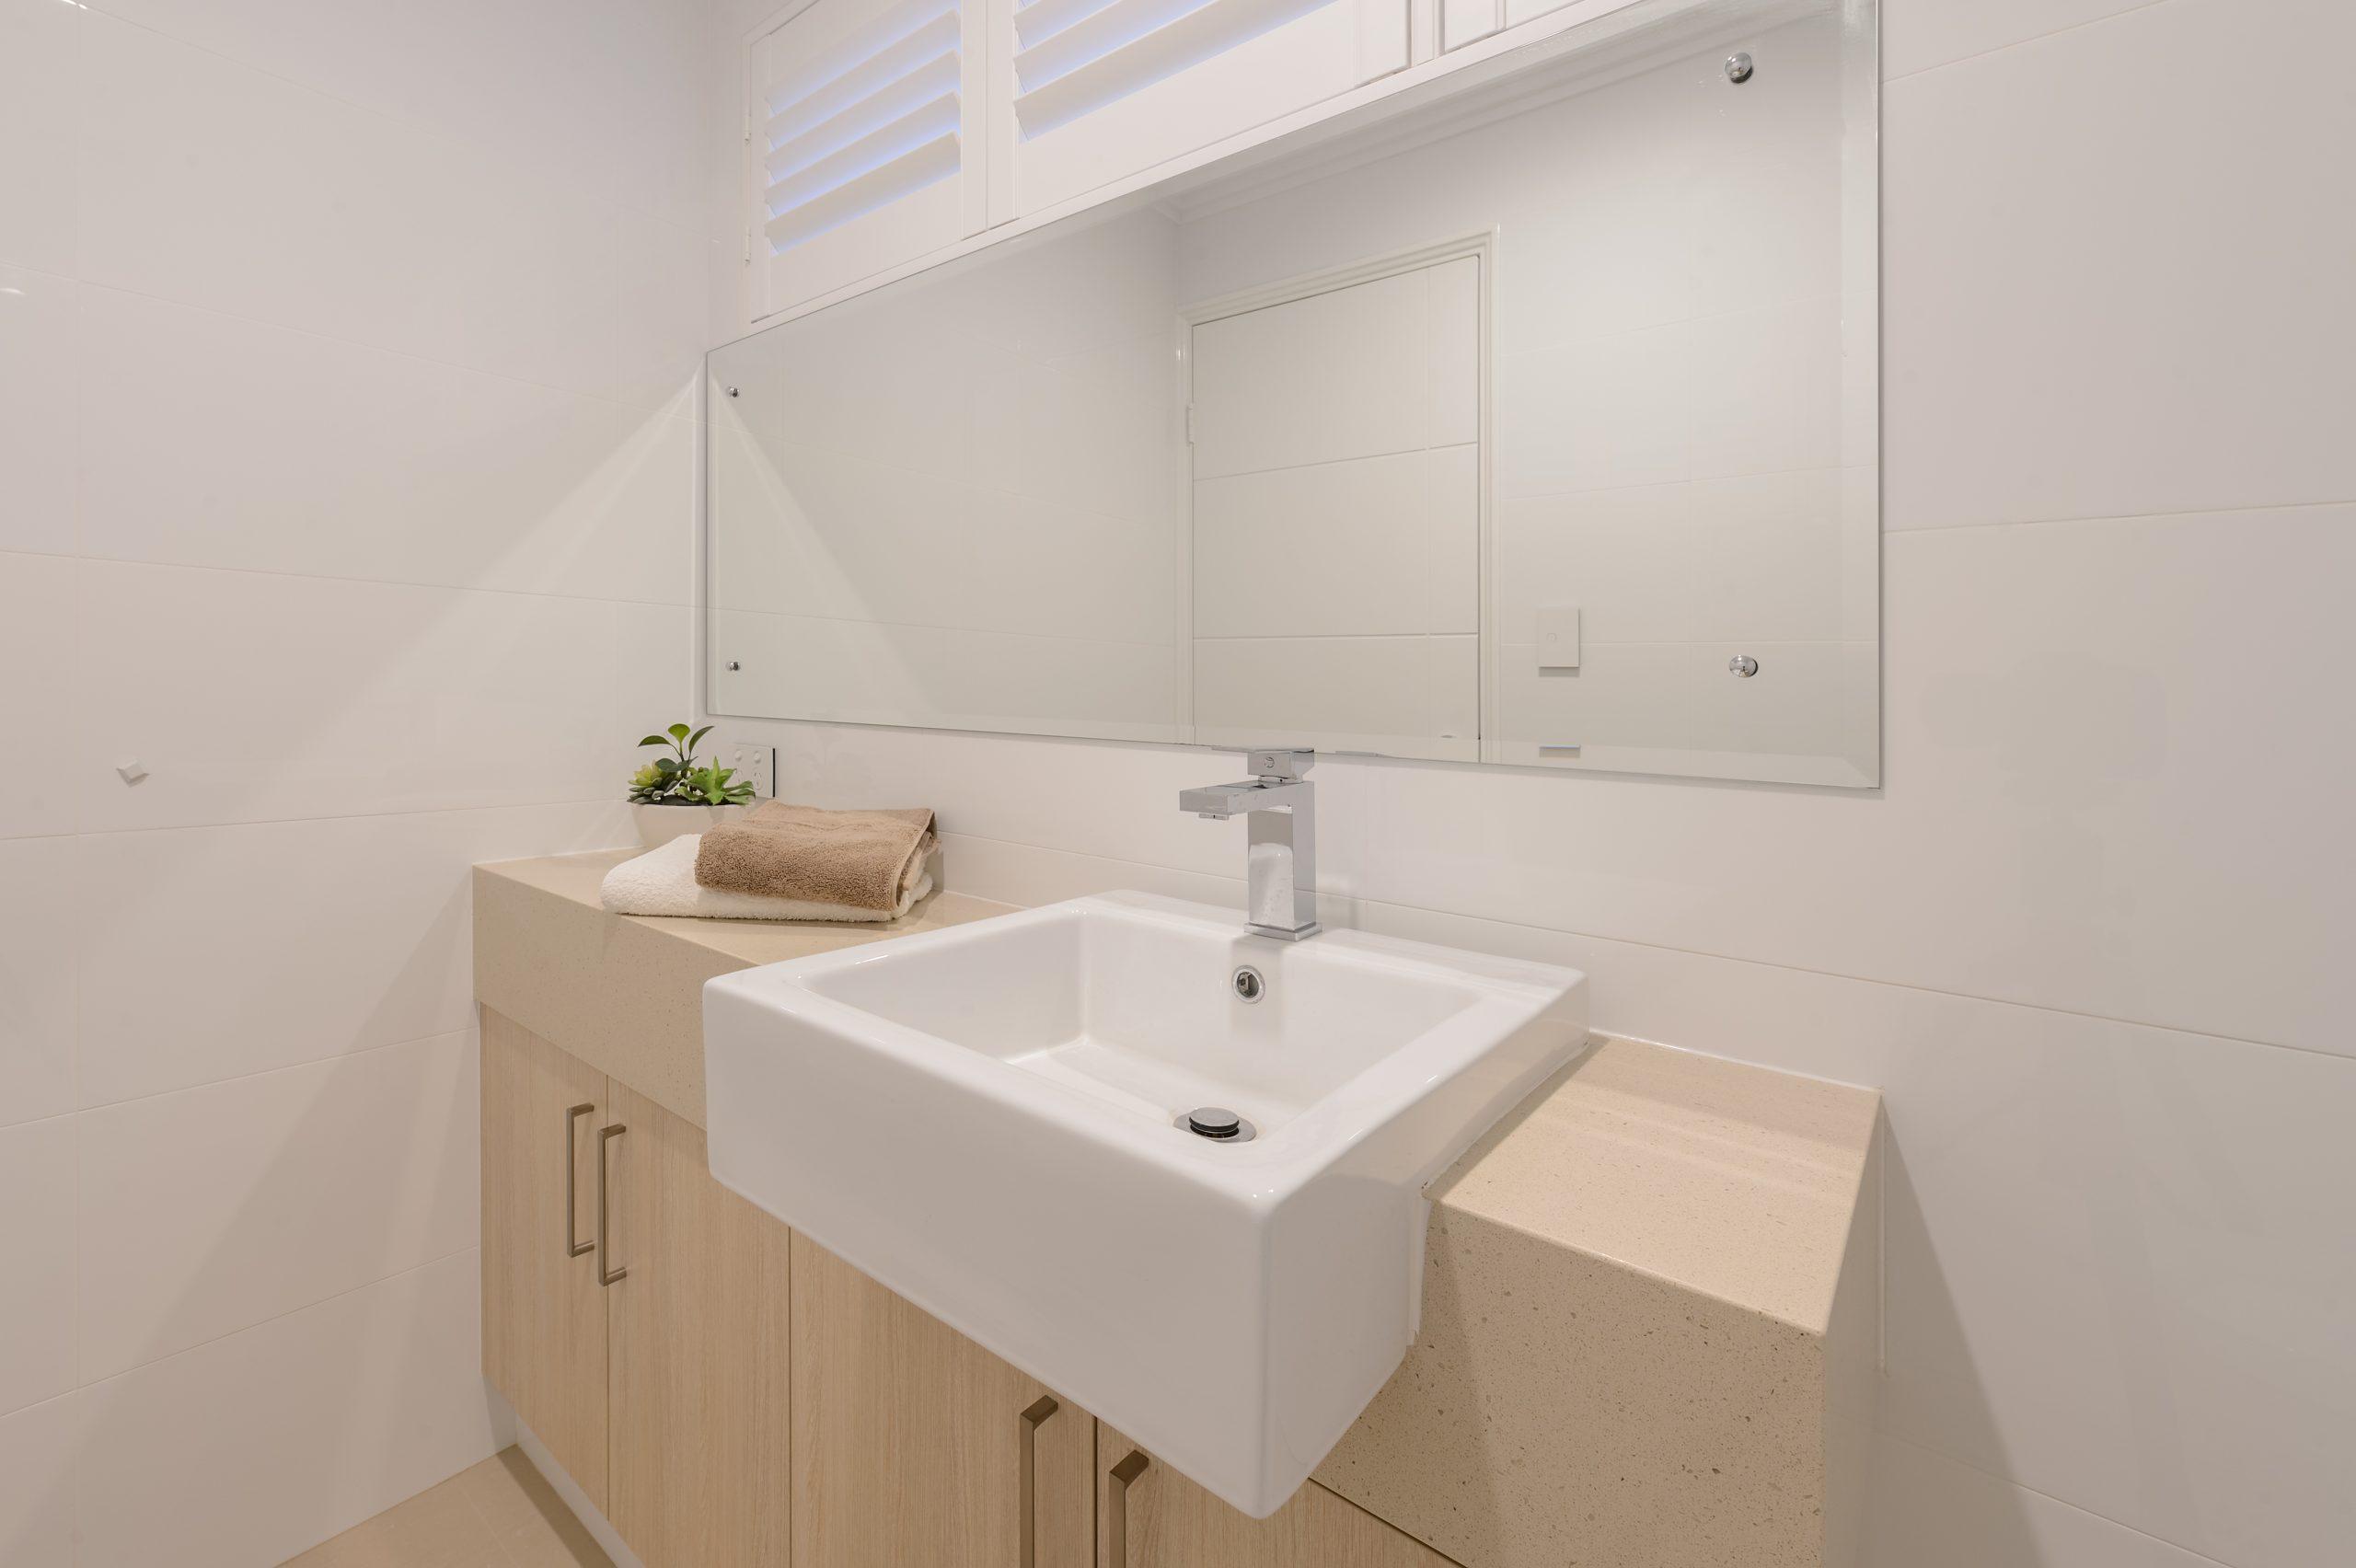 Bathroom with a large bathroom mirror, sink, bathroom cabinets and towels